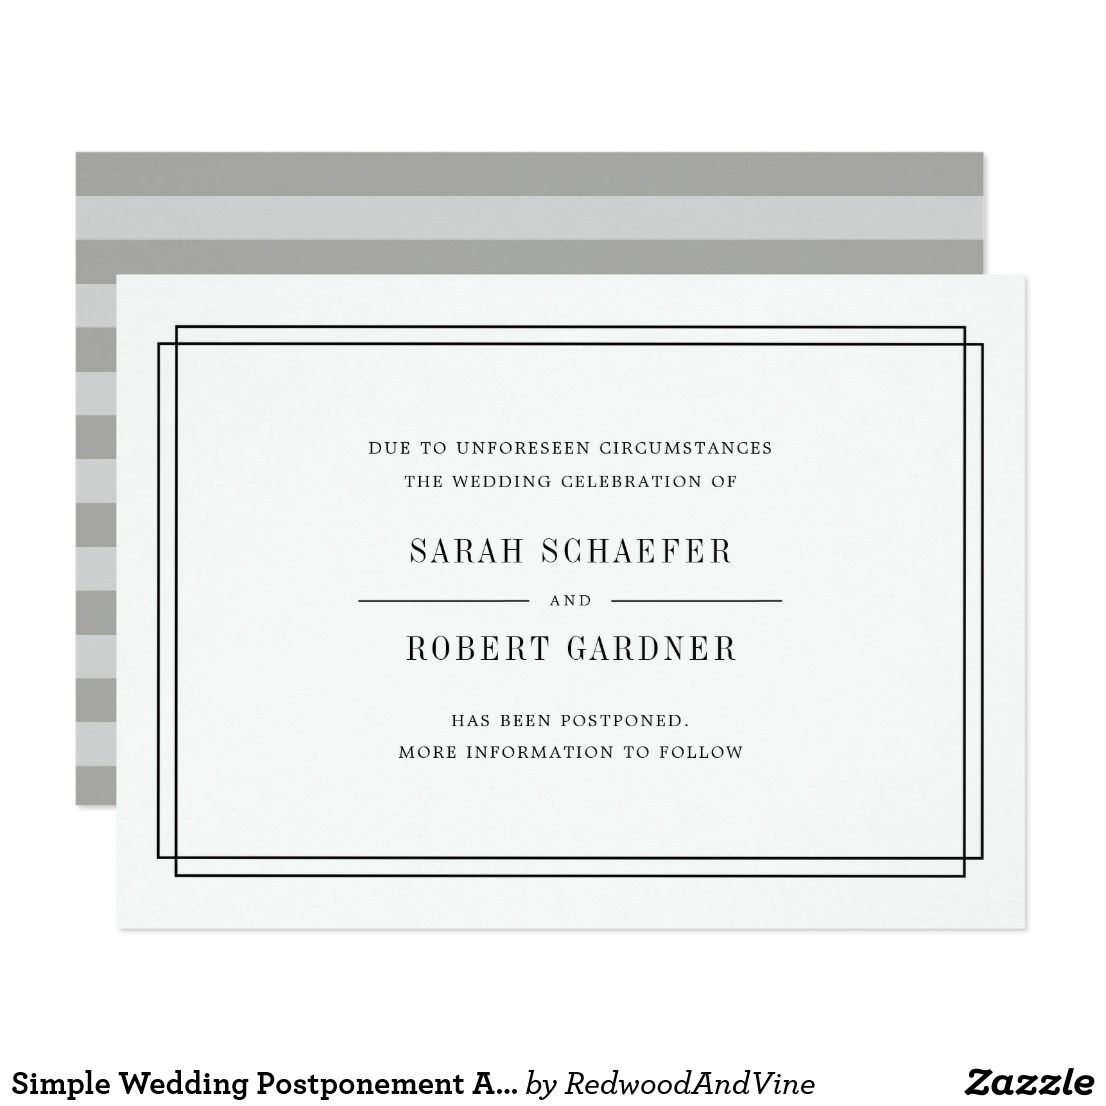 Simple Wedding Postponement Announcement Card Zazzle Com